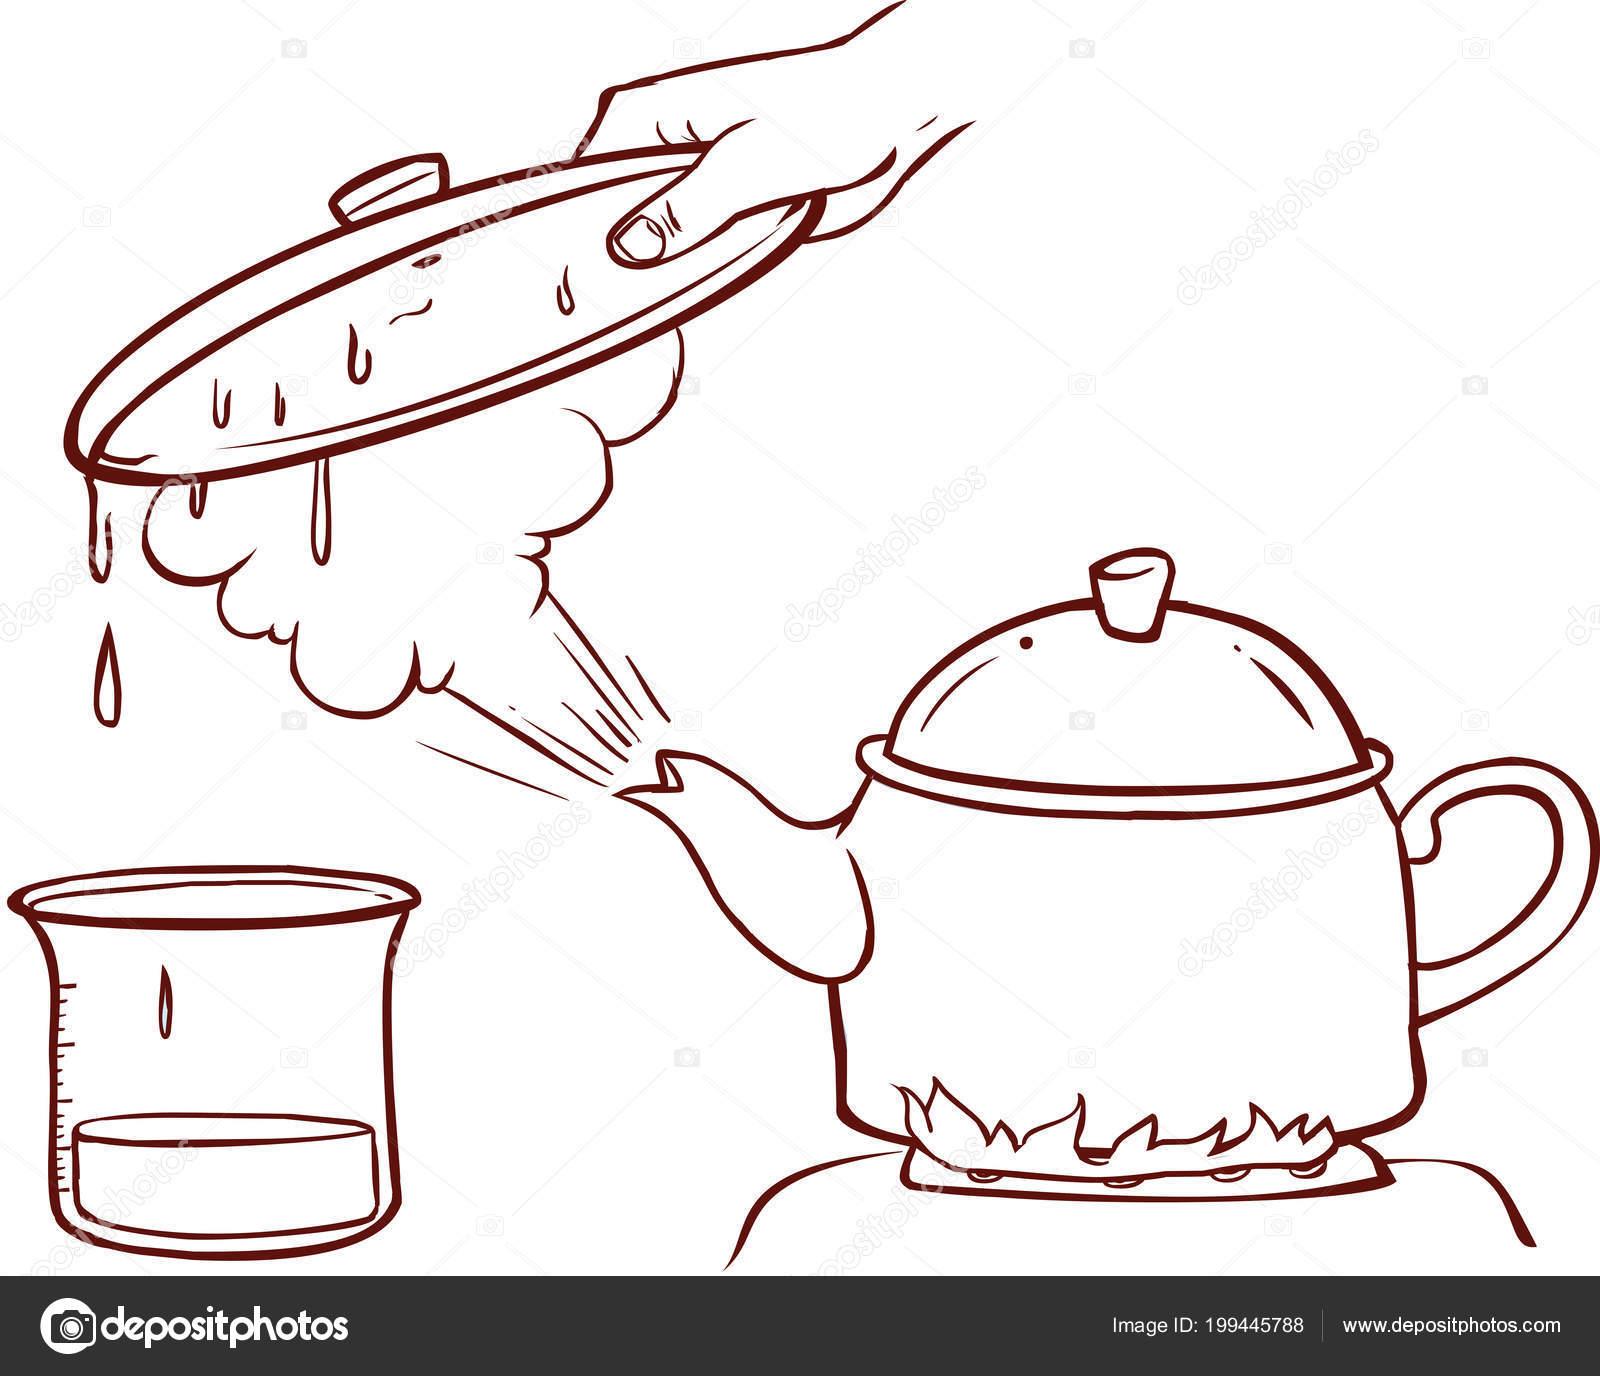 Evaporation Clip Art Wiring Diagrams 19800009 Ts19 Test Set Open Circuit Testing Short Ebay Teapot Clipart Water Stock Vector Corbacserdar Gmail Rh Depositphotos Com